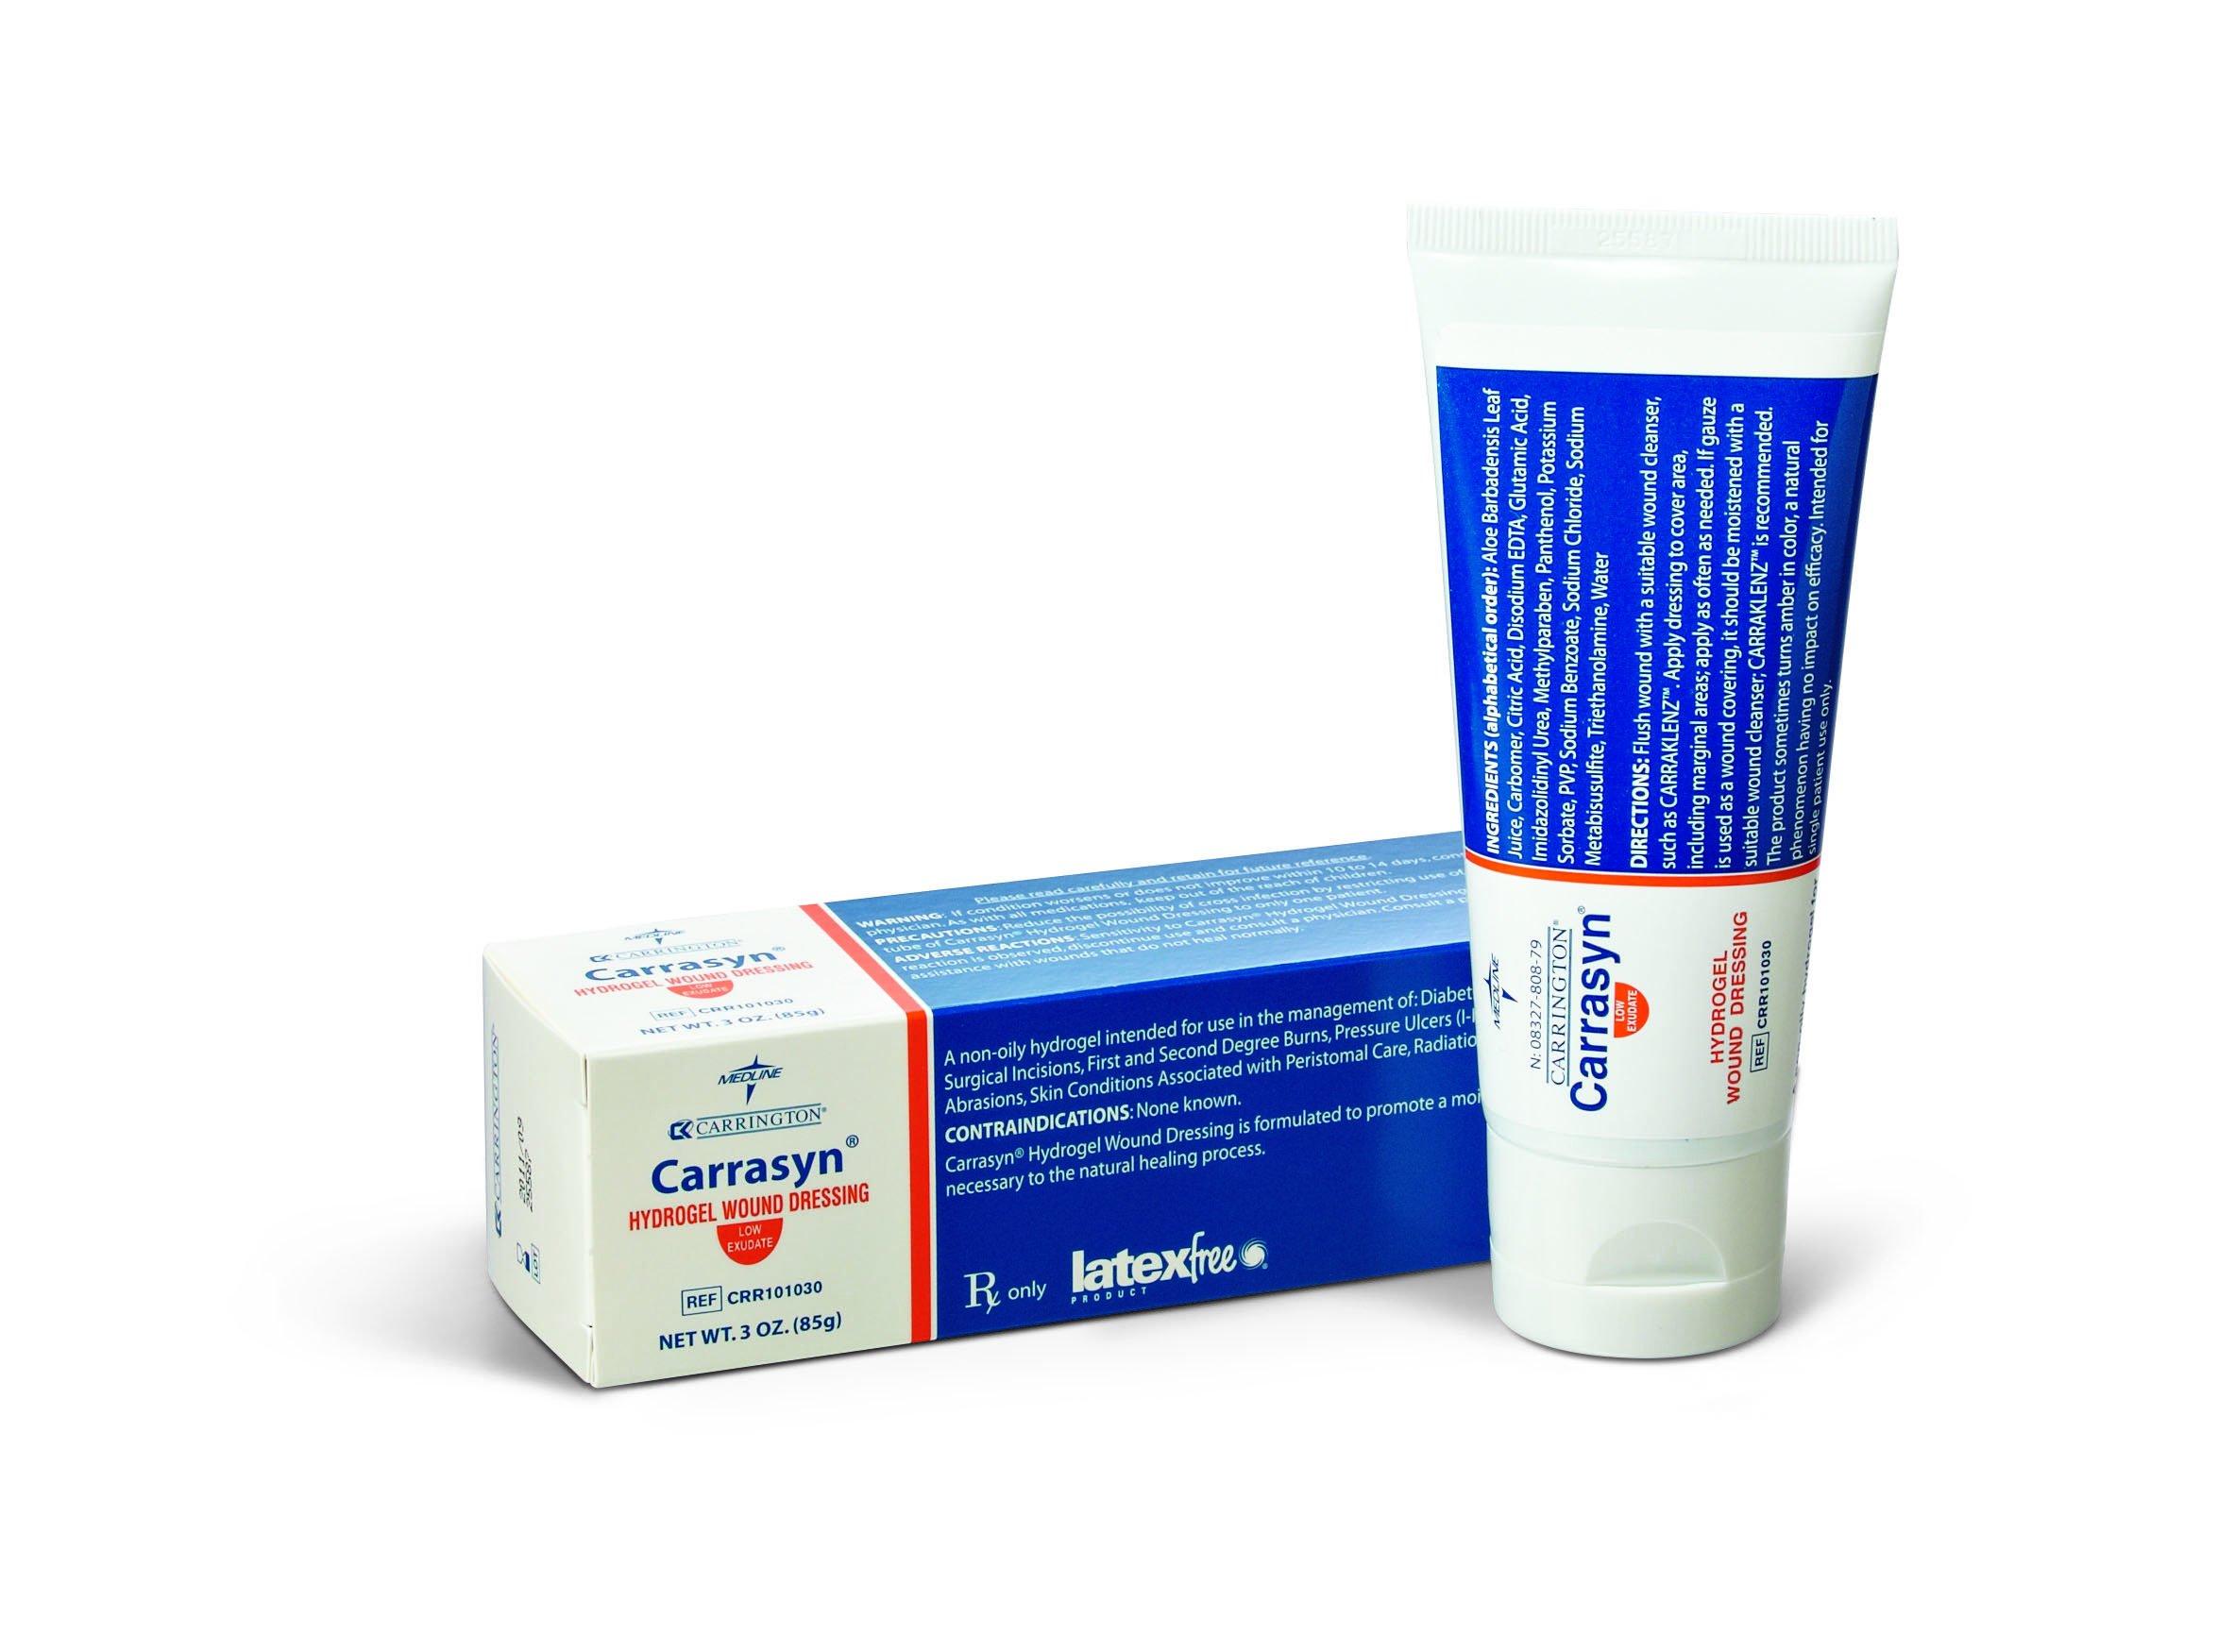 Medline Industries CRR101030 Carrasyn Hydrogel, 3 oz Tube, 12 Pack (Pack of 12) by Medline